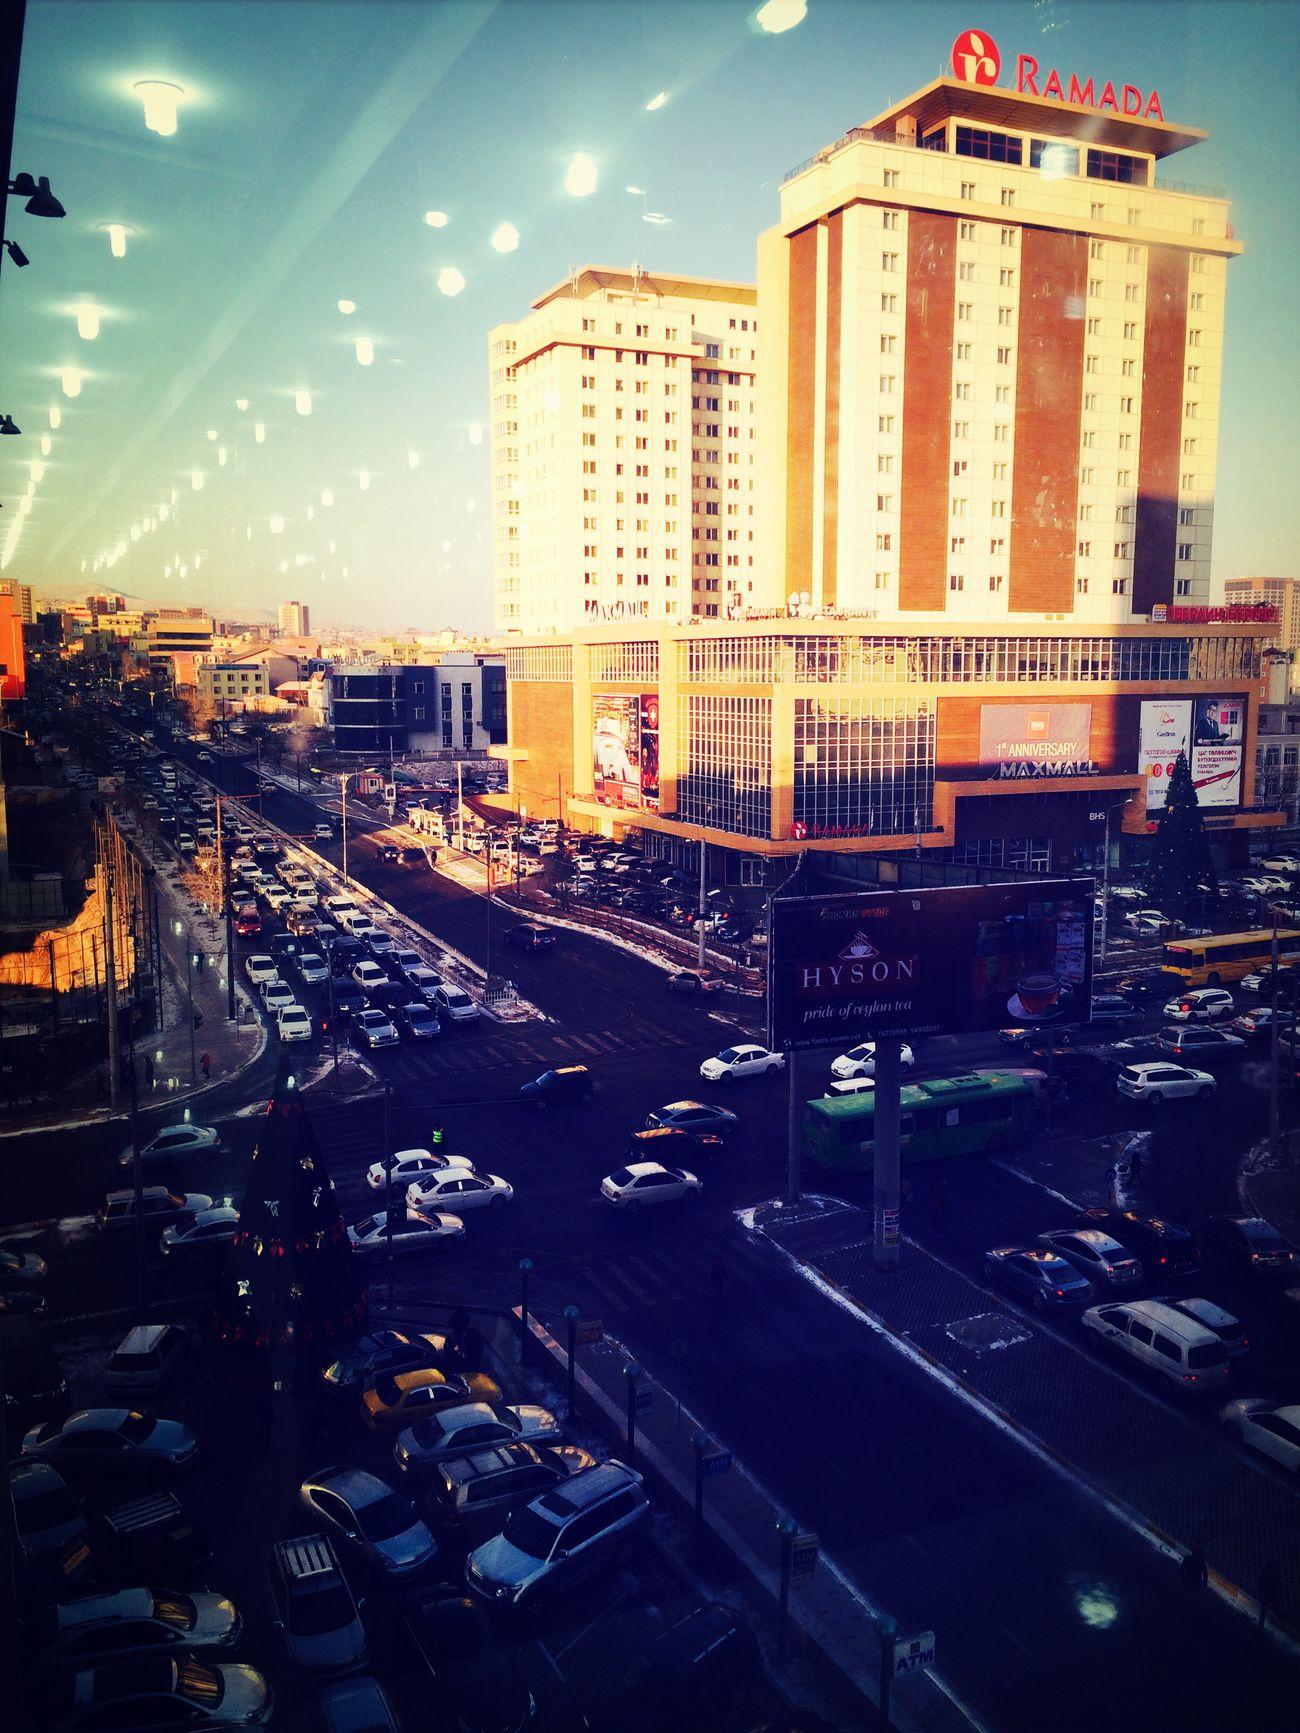 Ramada Hotel Today :)